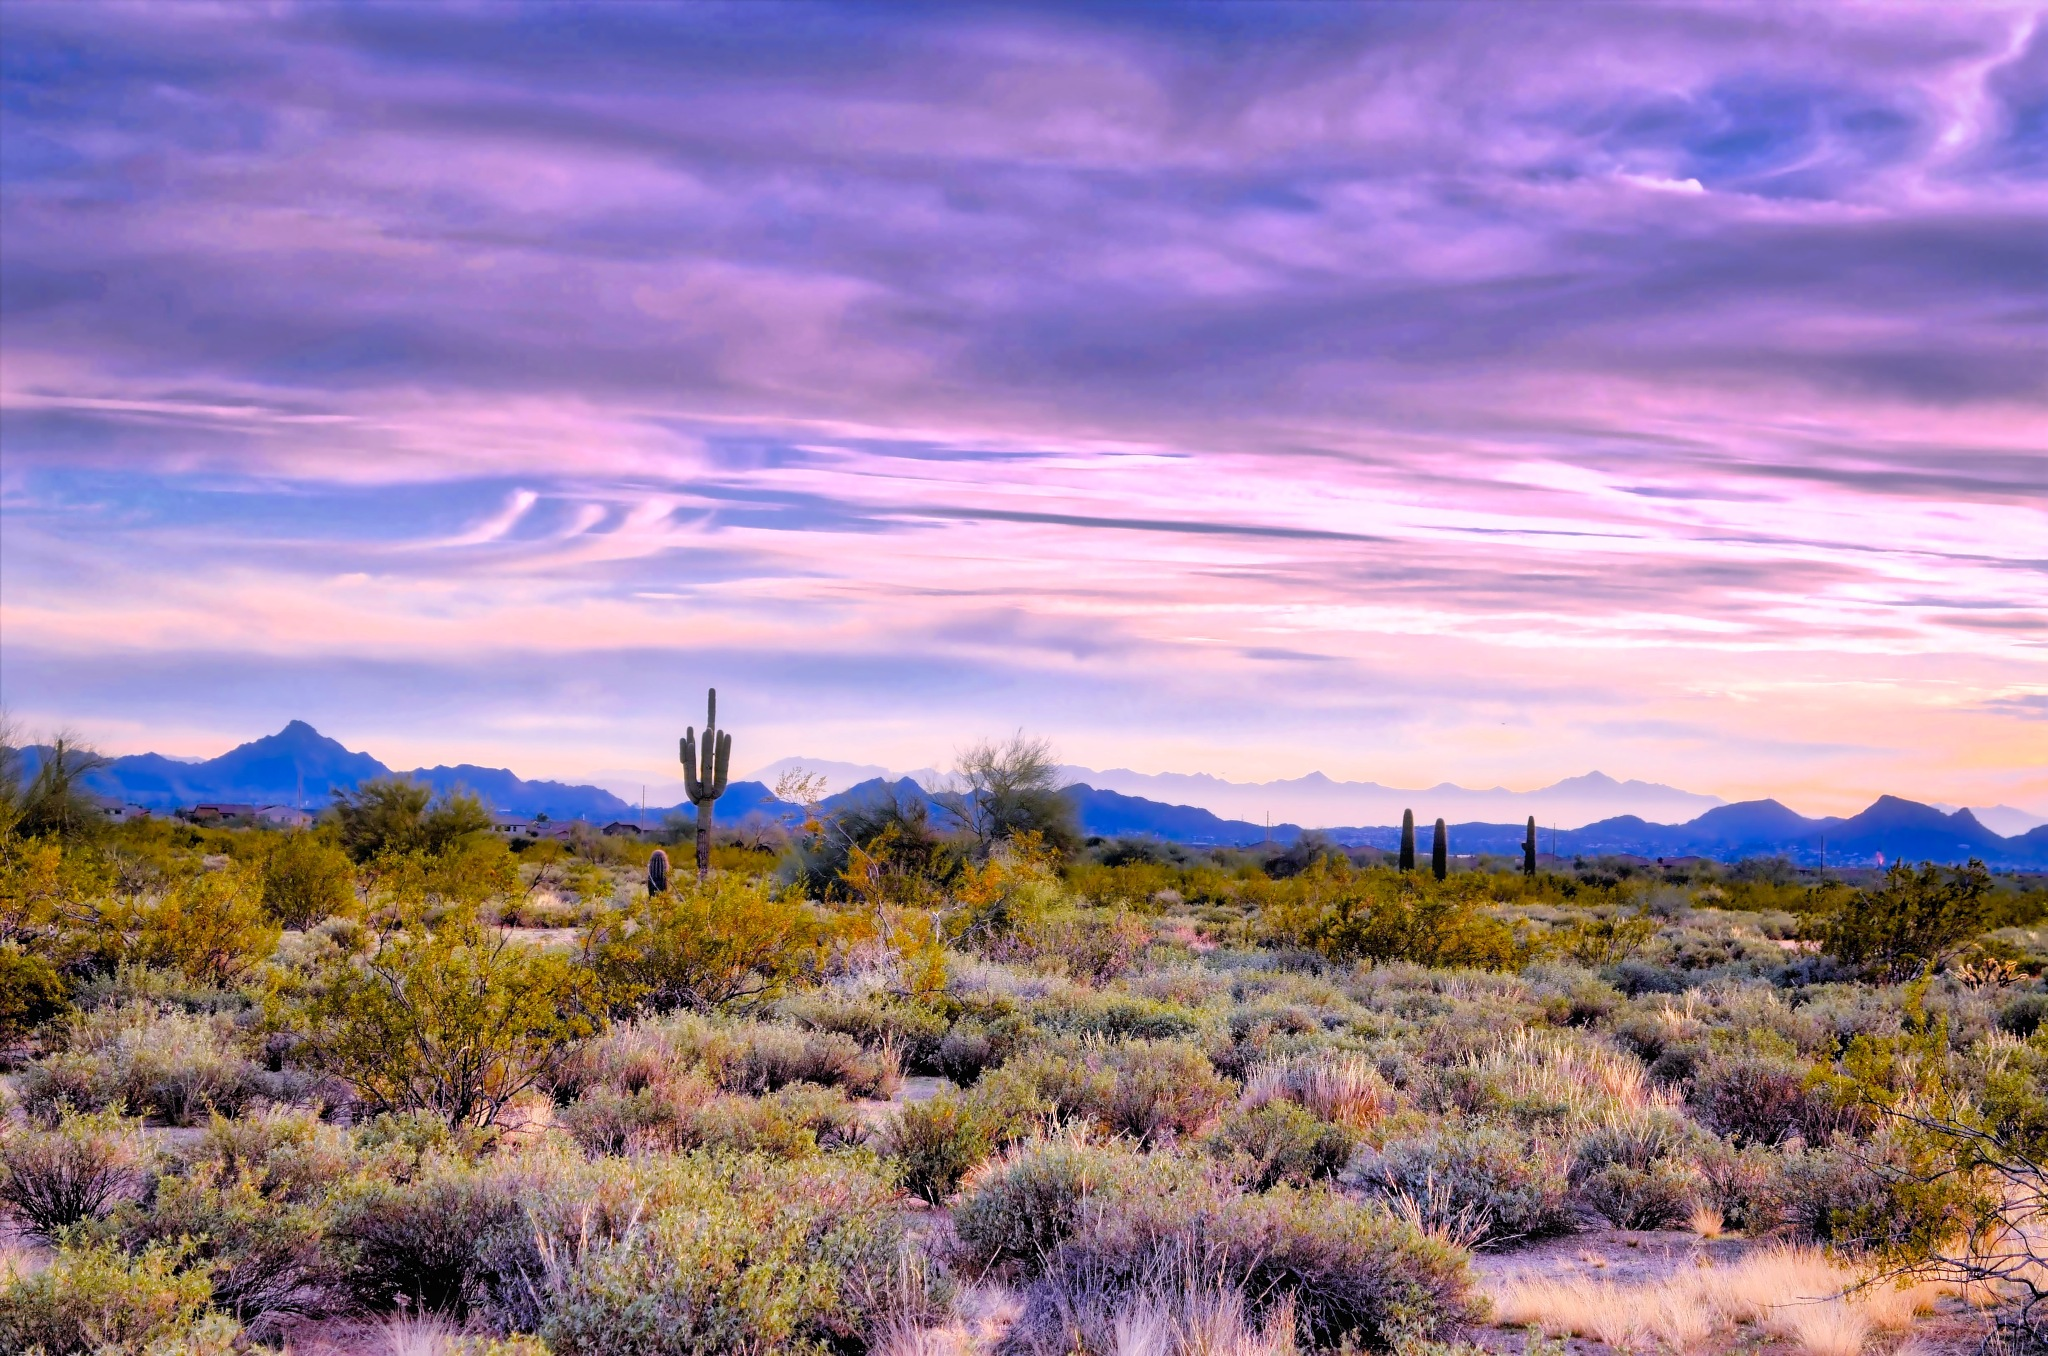 Arizona Desert by Harrison Hanville